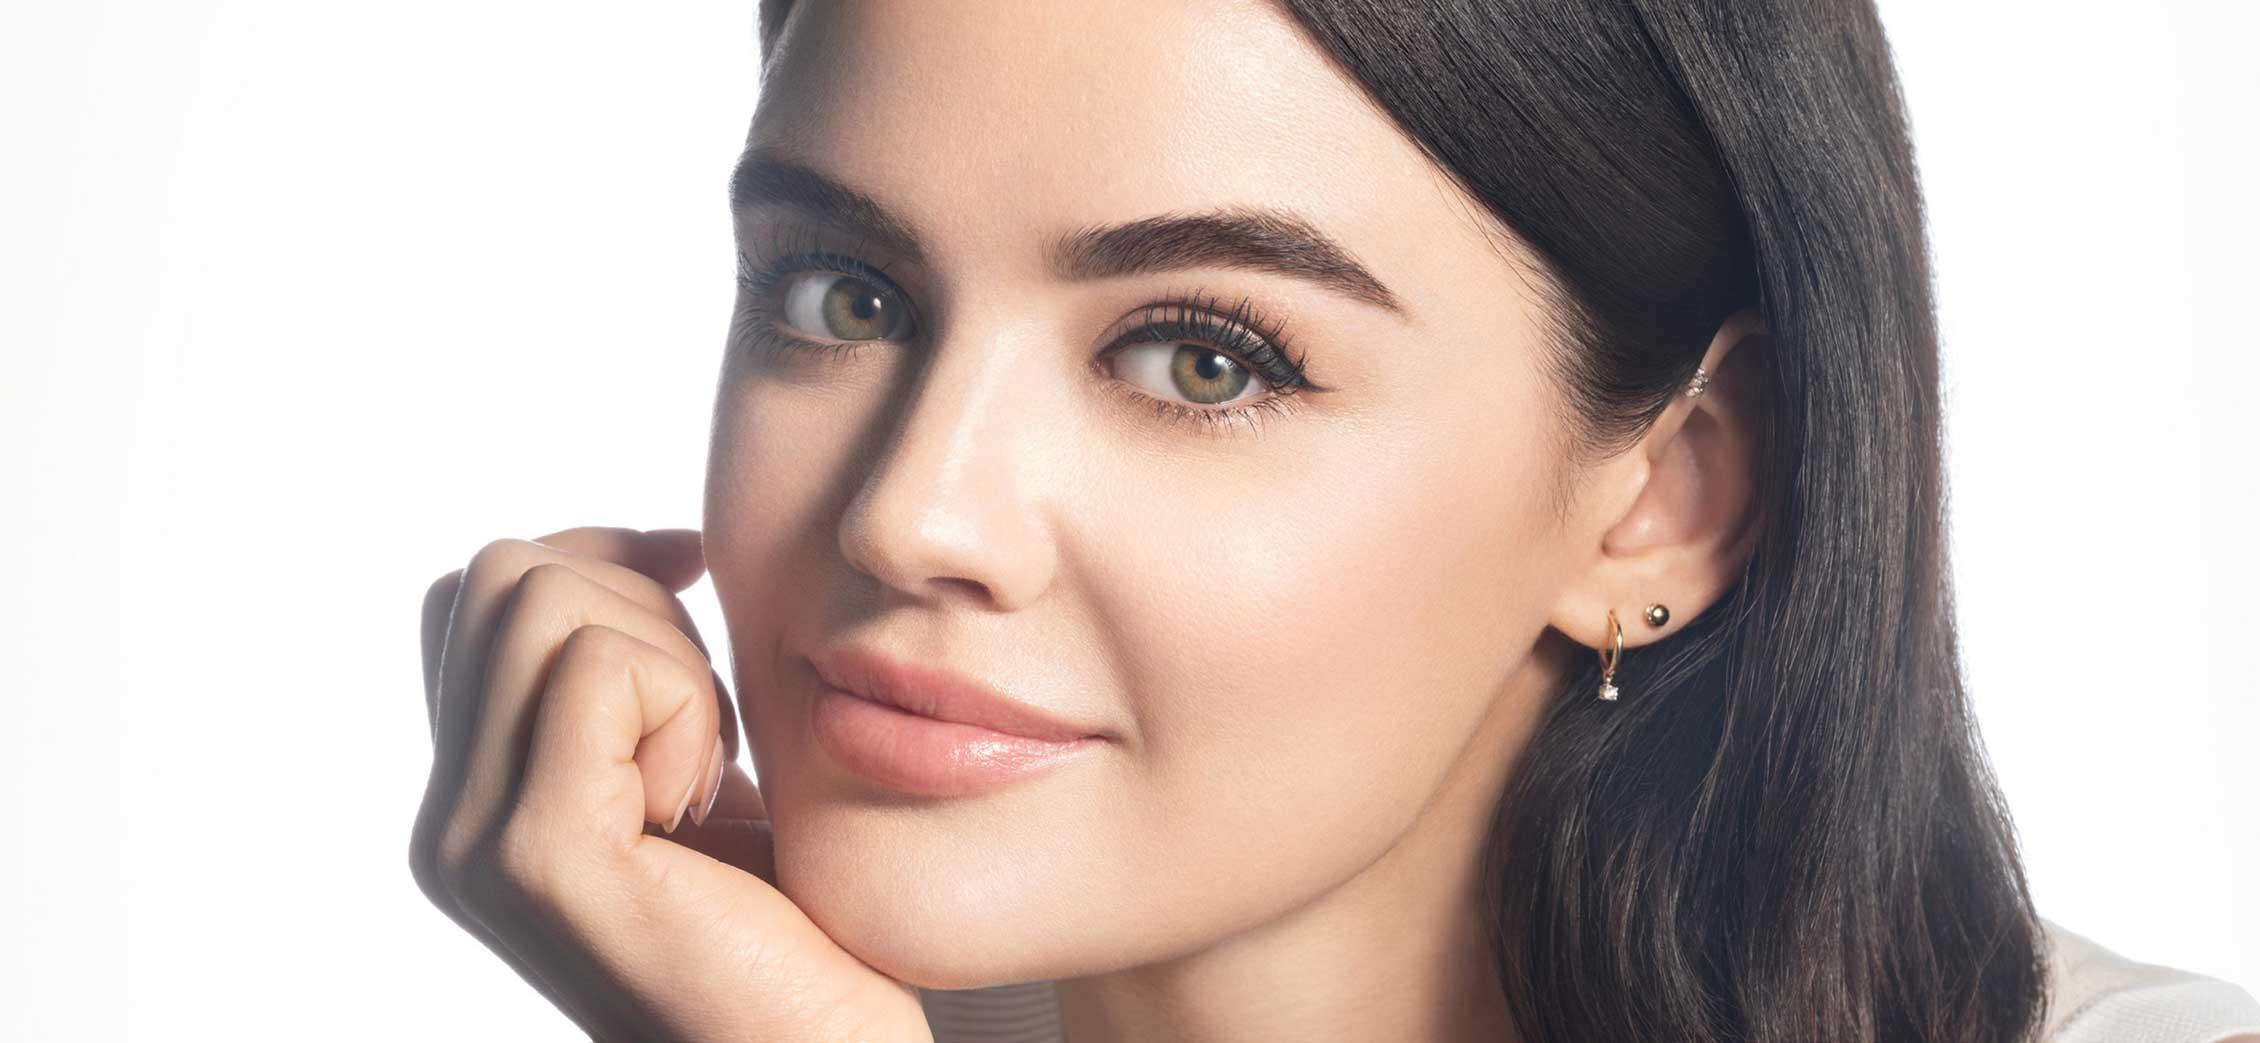 Lucy Hale becomes ALMAY's global brand ambassador